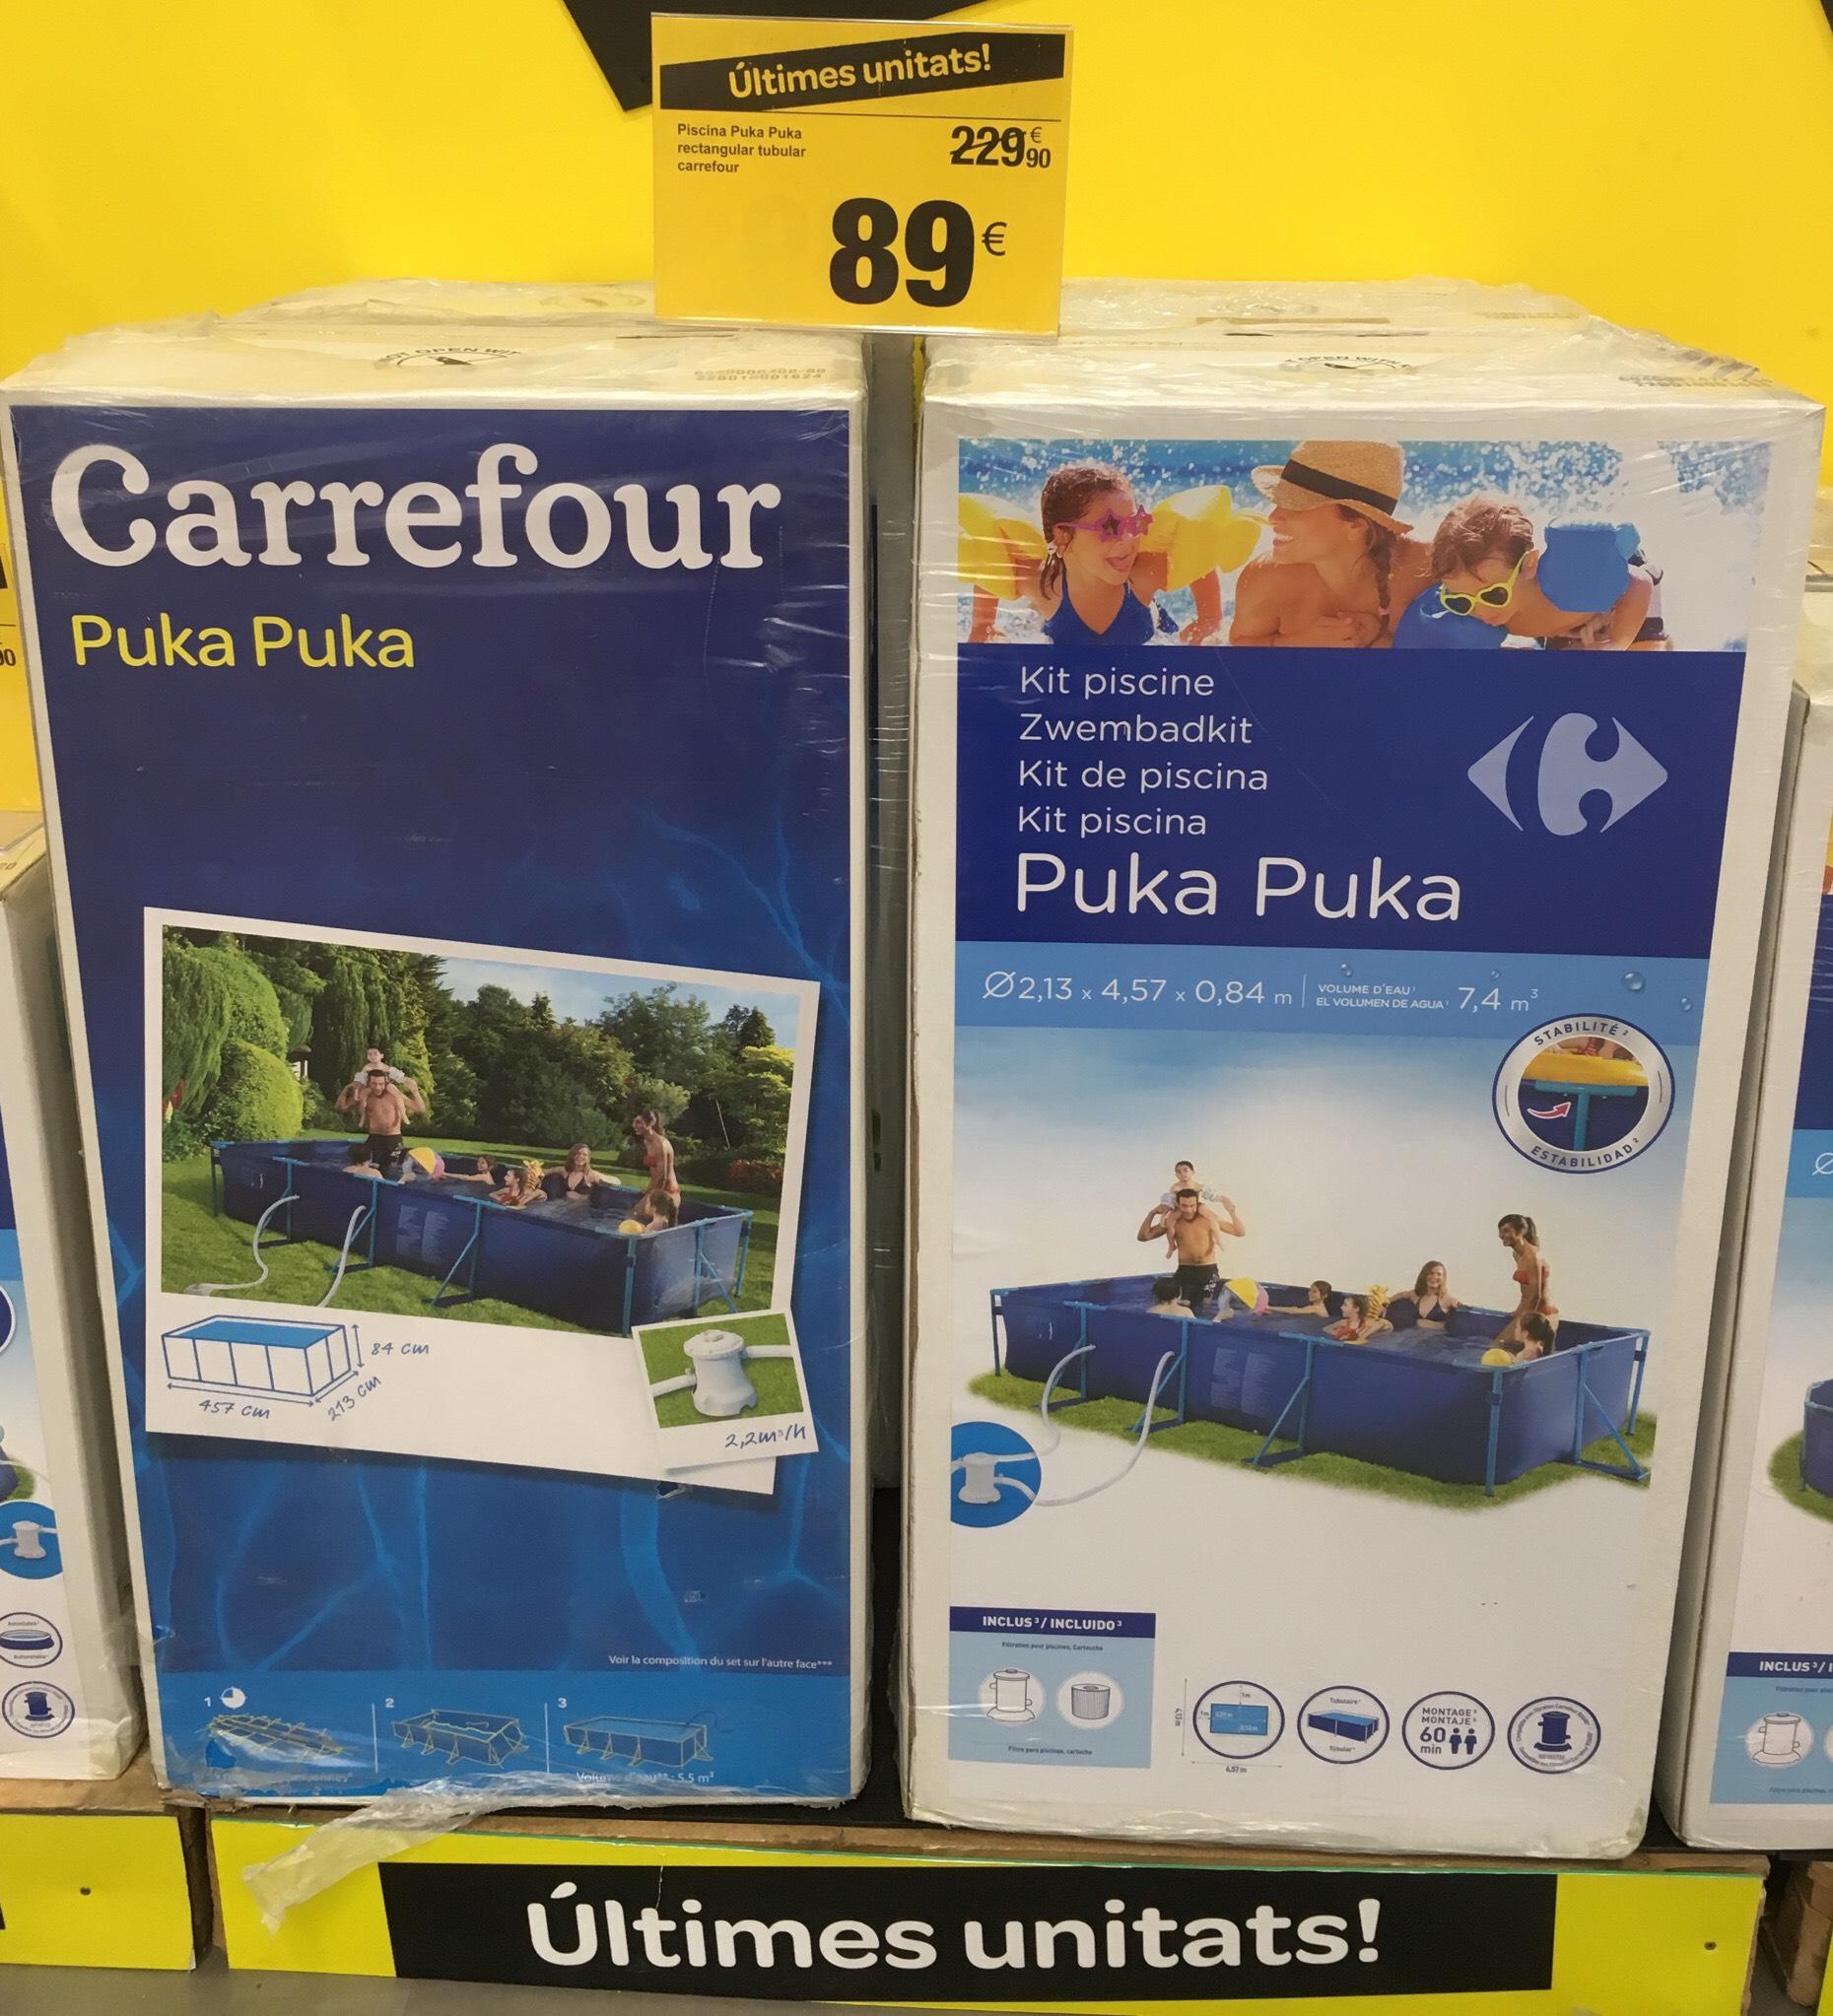 Piscina Puka Puka Carrefour